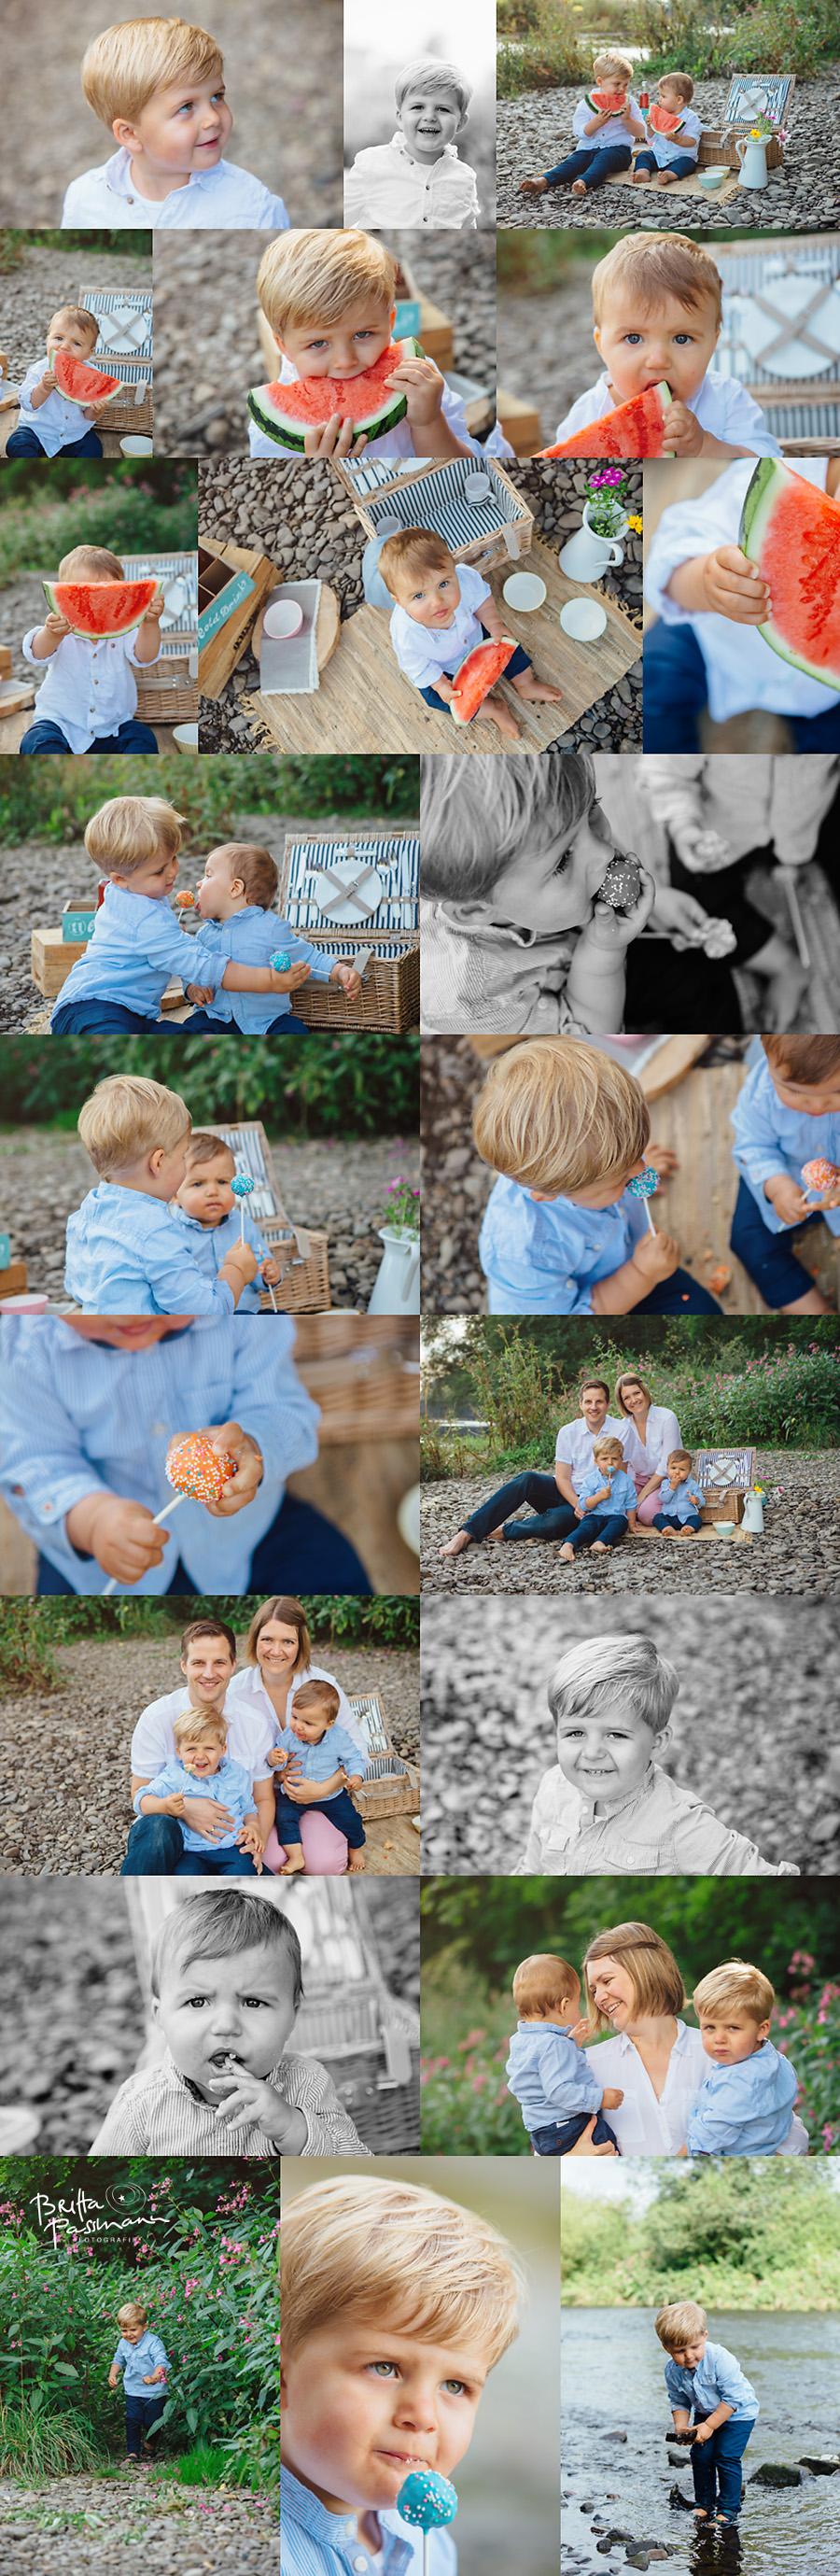 Familienpicknick_Fotoshooting_Familienfotos_Kinderfotos_Dortmund_Schwerte_06